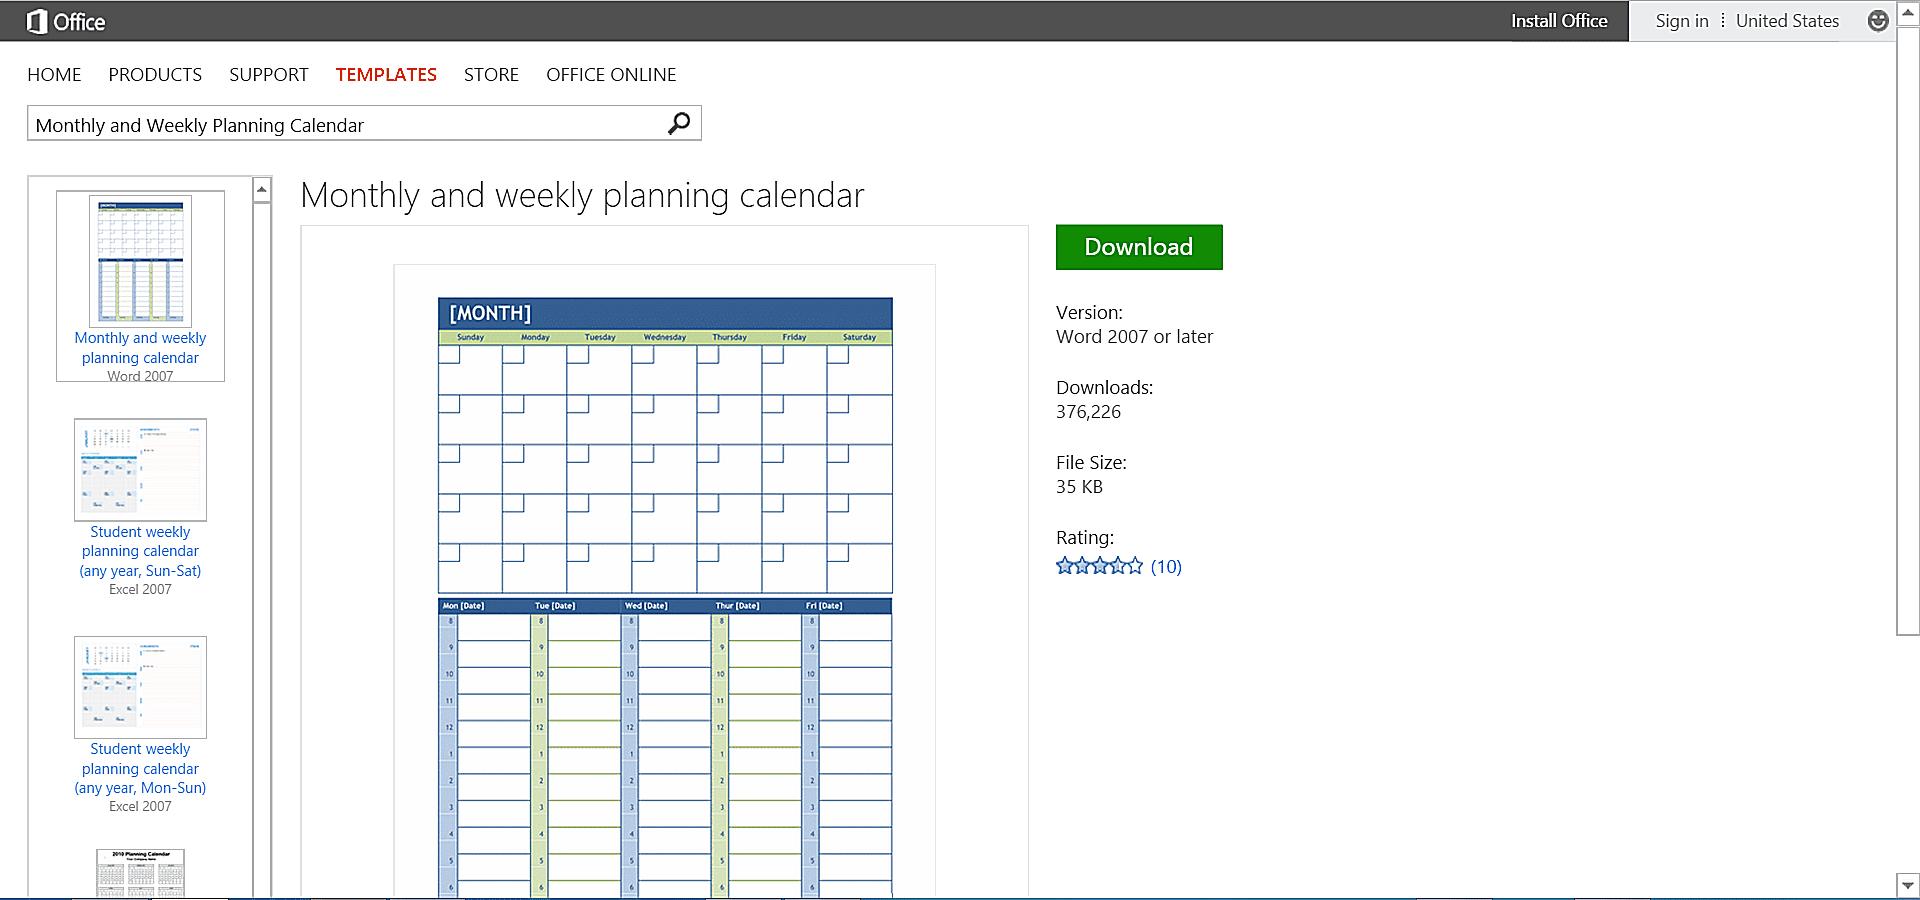 Customizable Calendar Templates For Microsoft Office